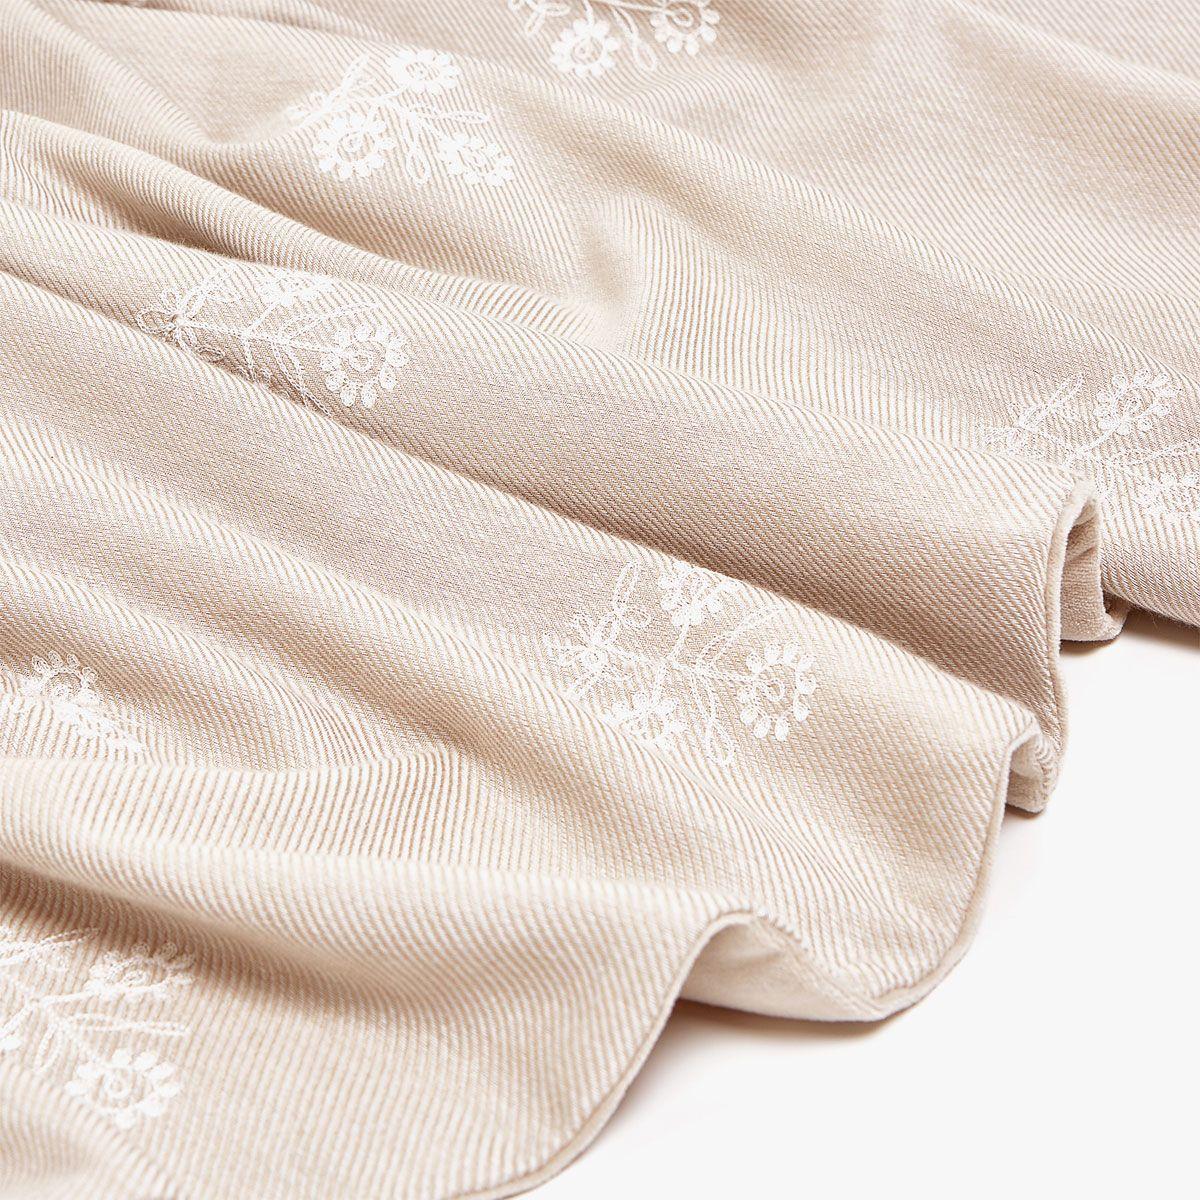 Embroidered bedspread with velvetcovered tassels Bedspread